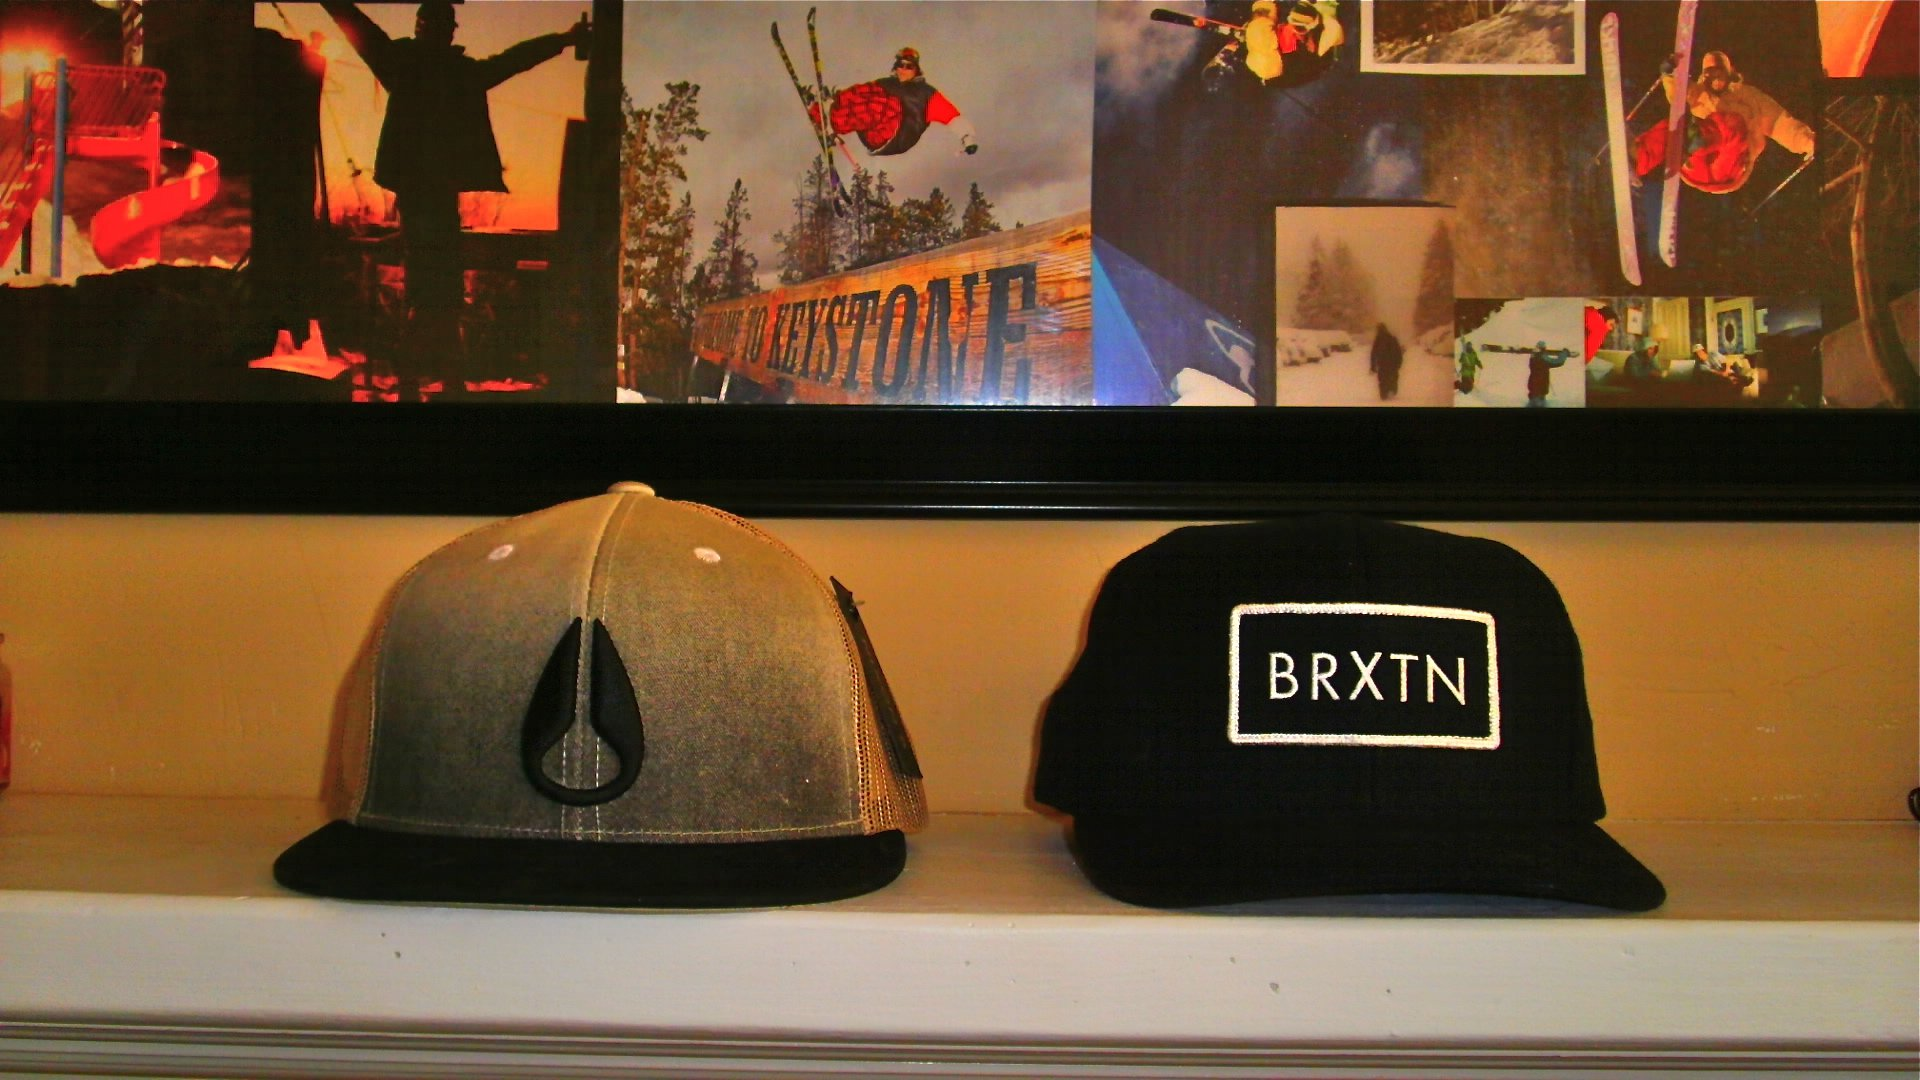 FS/FT Nixon and Brixton